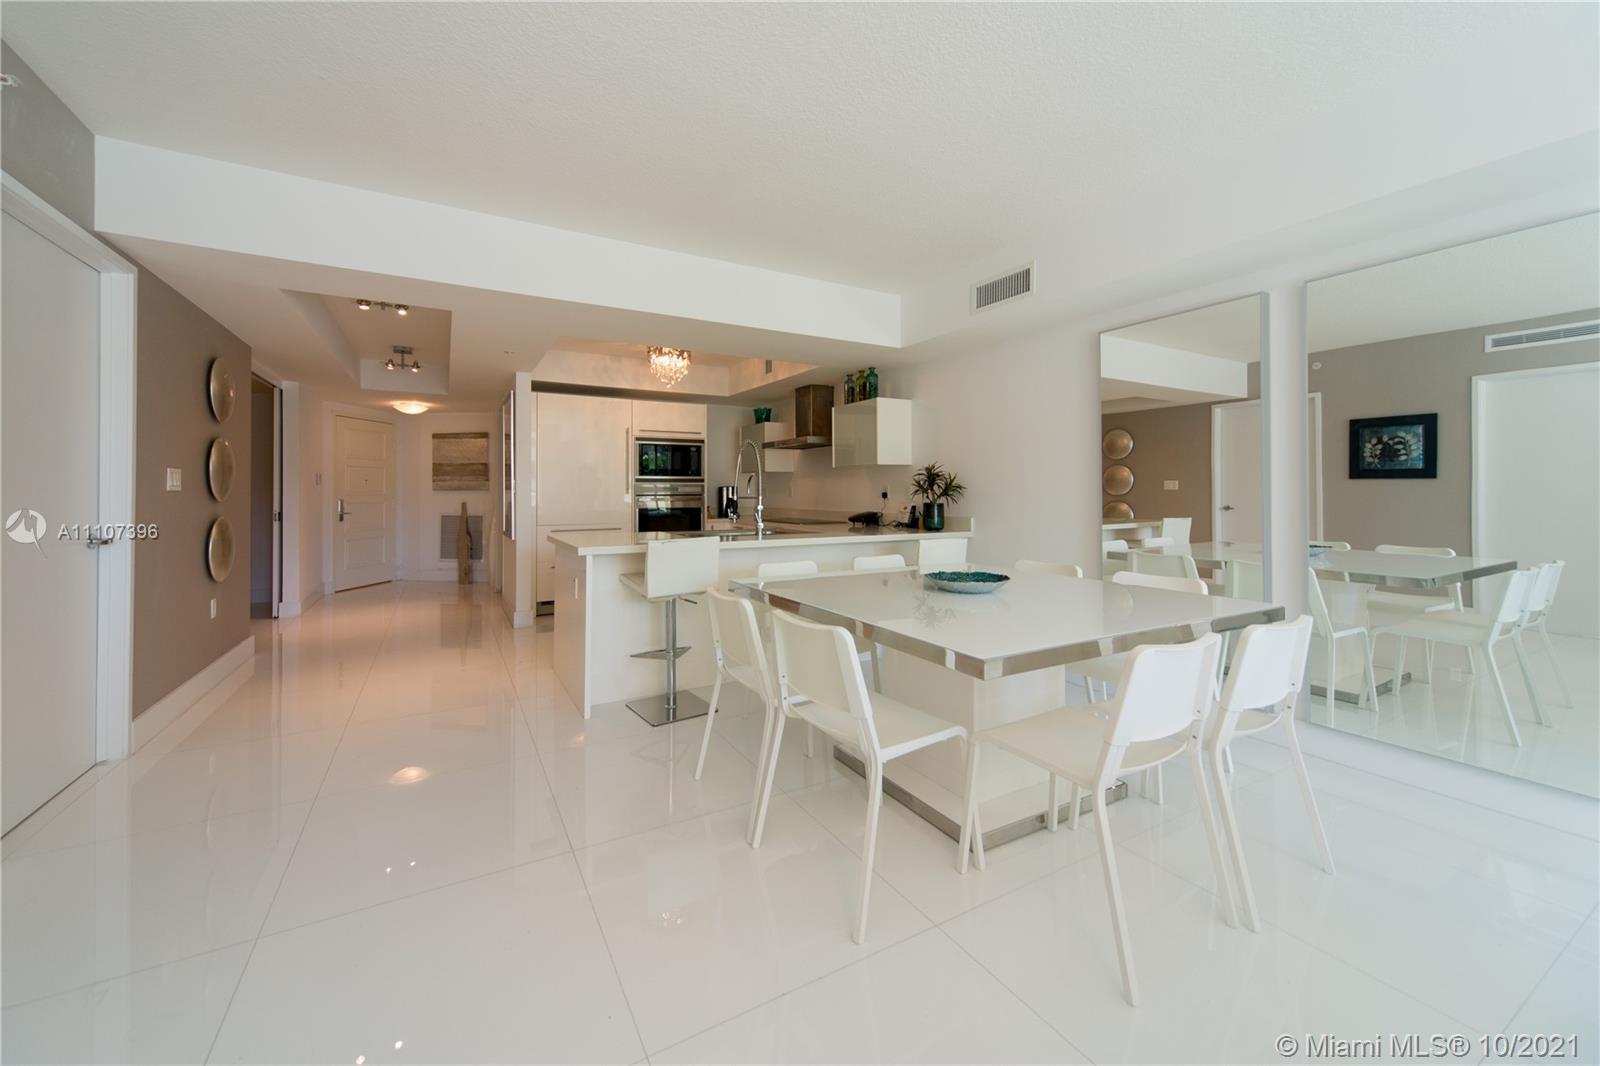 St Tropez III #TH-207 - 250 Sunny Isles Blvd #TH-207, Sunny Isles Beach, FL 33160